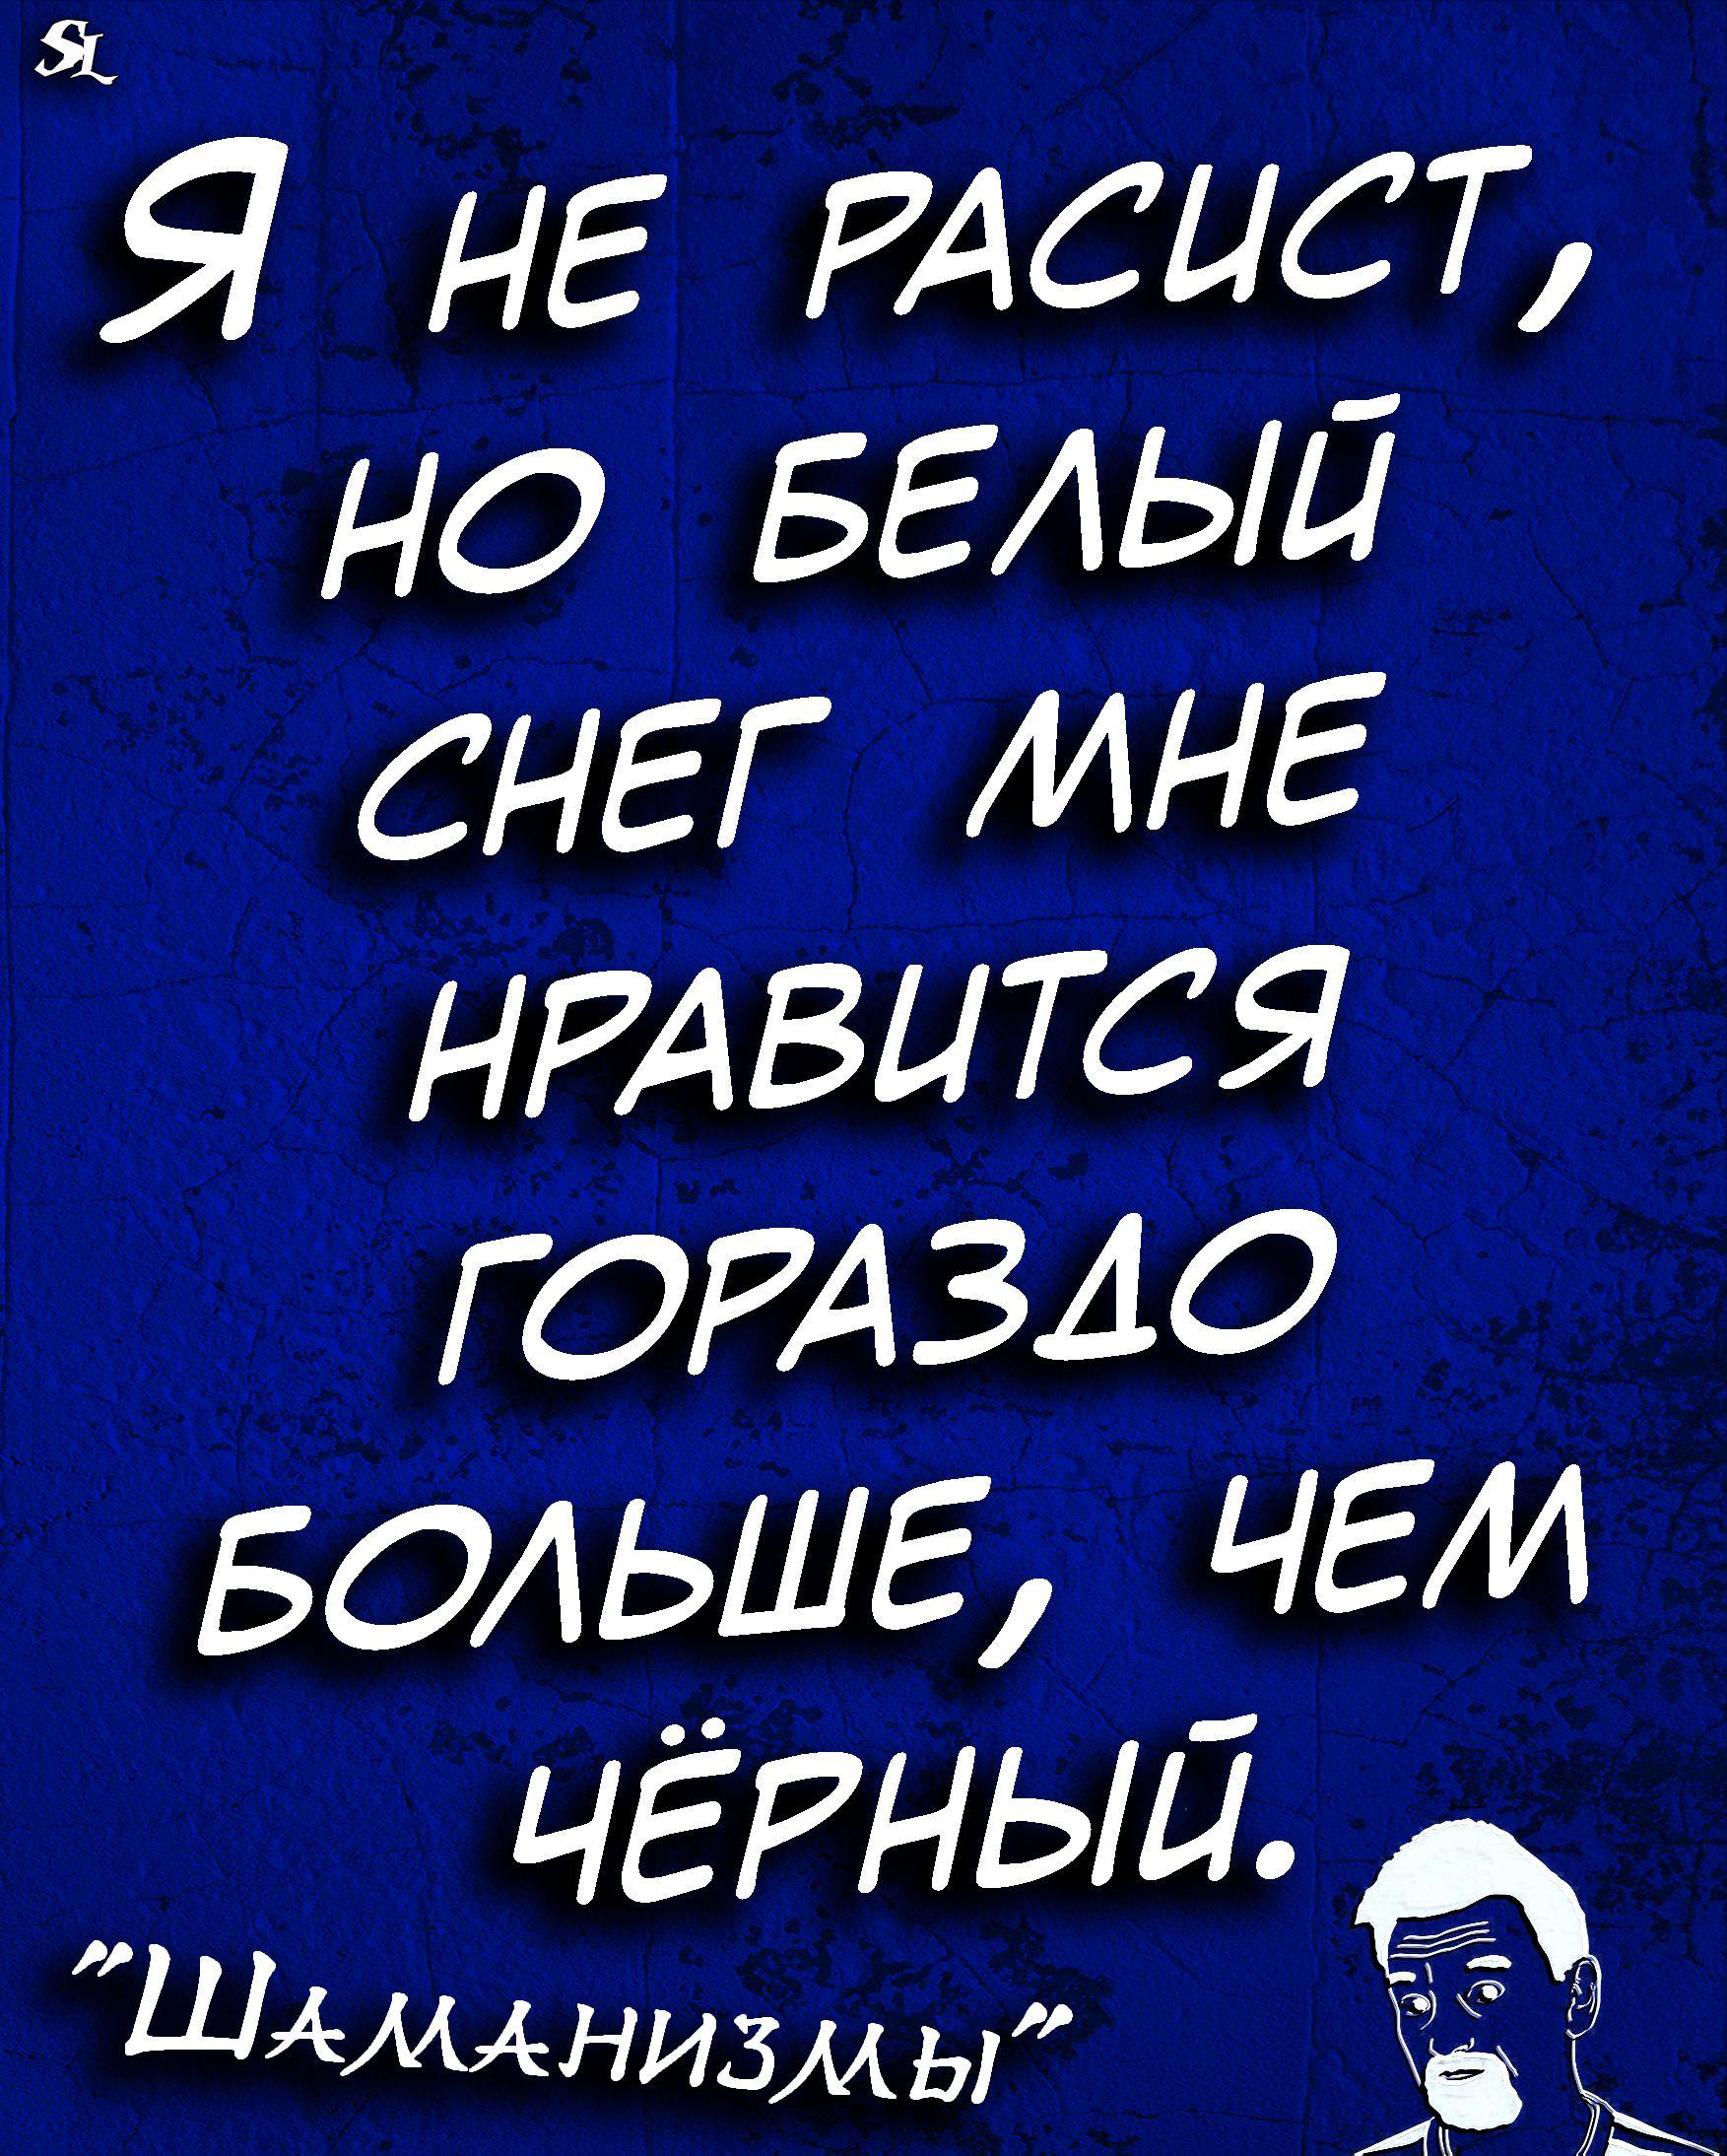 Shamanizmy Shutki Prikol Yumor Jokes Funny Humor Memes Shaman Ledentsov Sl Shaman Ledentsov Humor Quotations Jokes